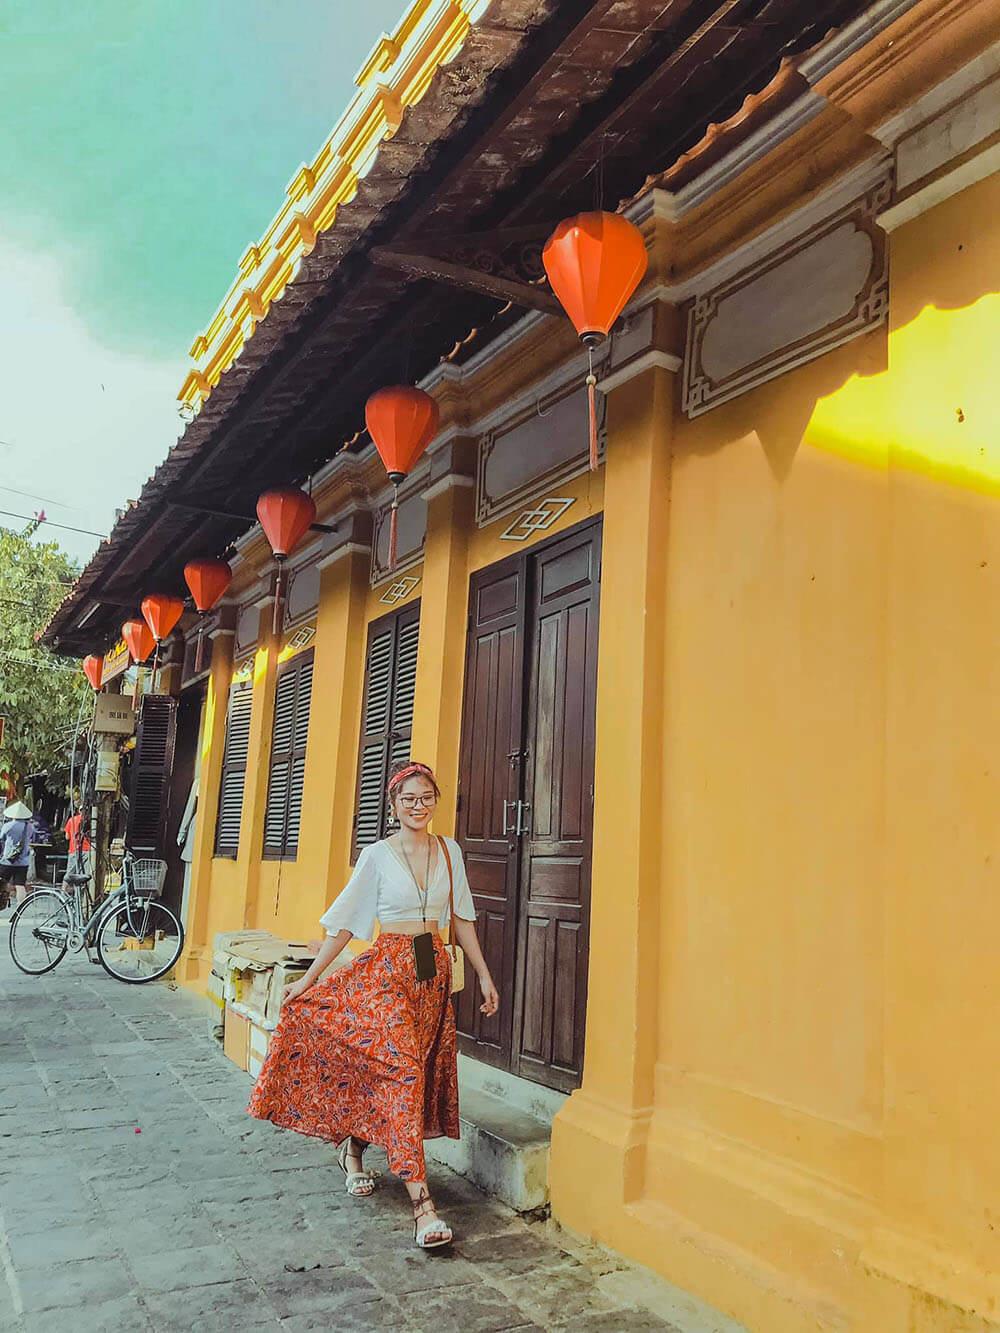 Pho Co Hoi An Review Chuyen Du Lich Hoi An Da Nang Cua 02 Co Ban Than 01